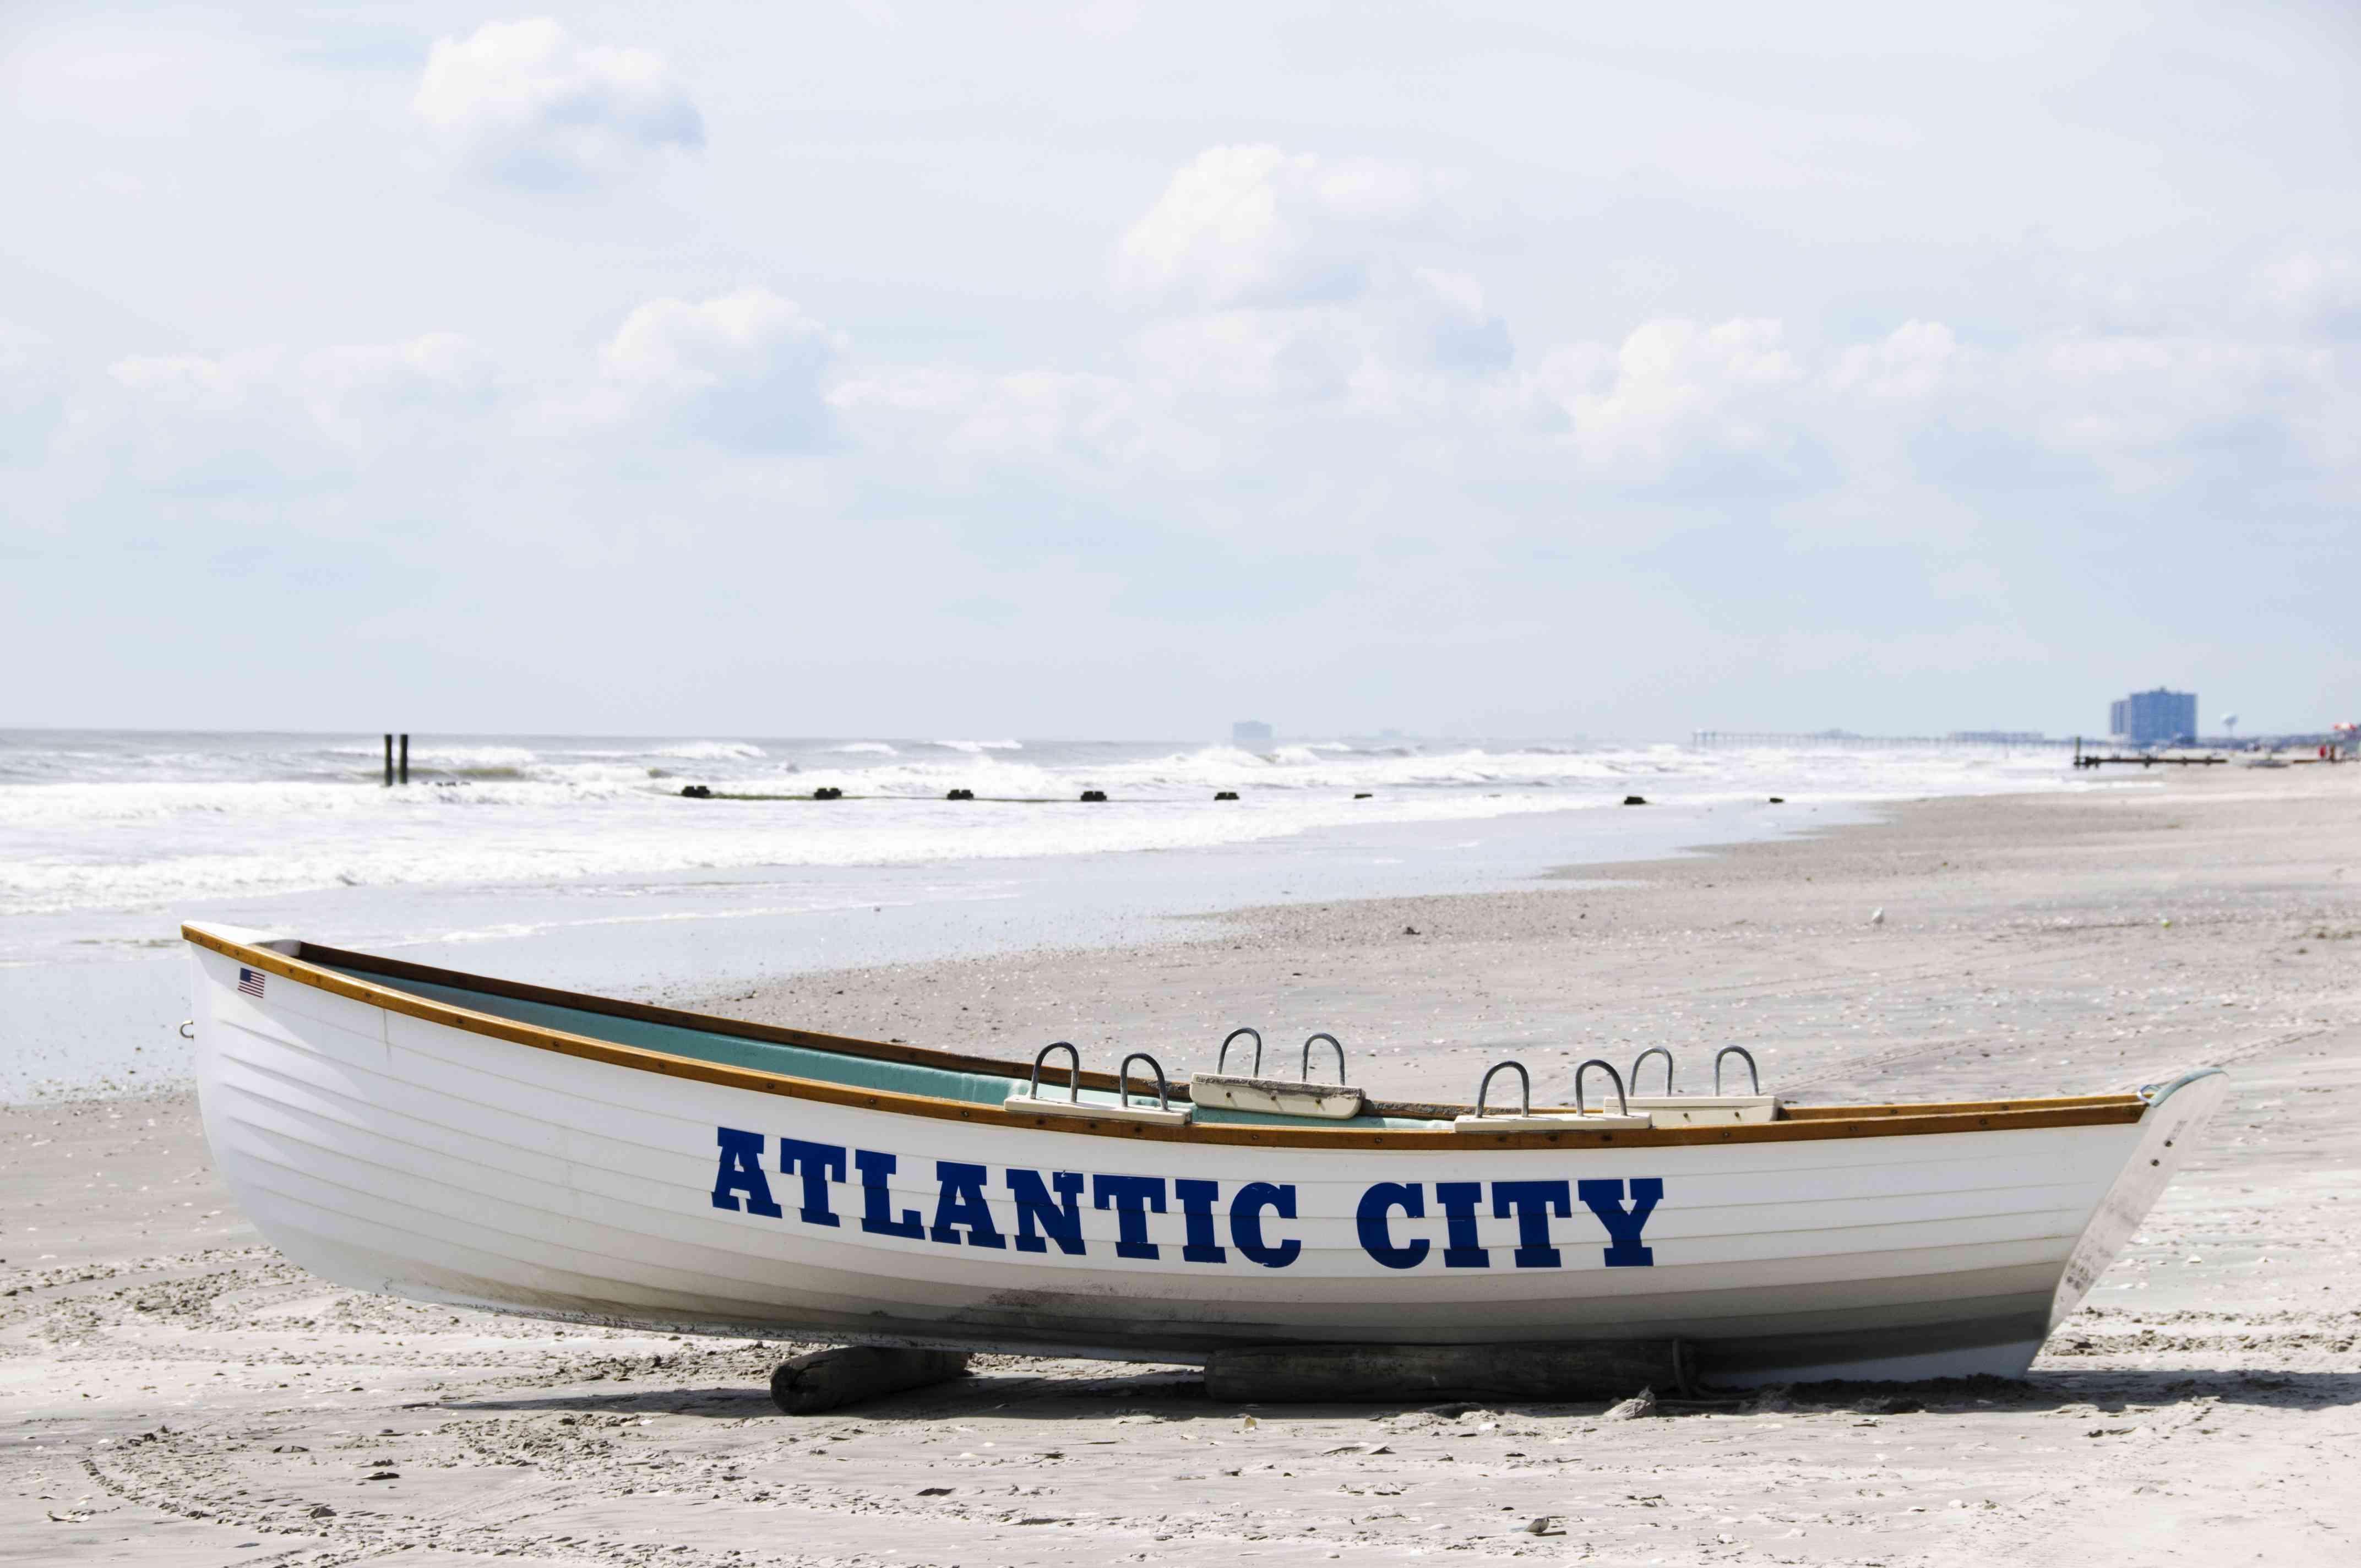 Boat on Atlantic City beach